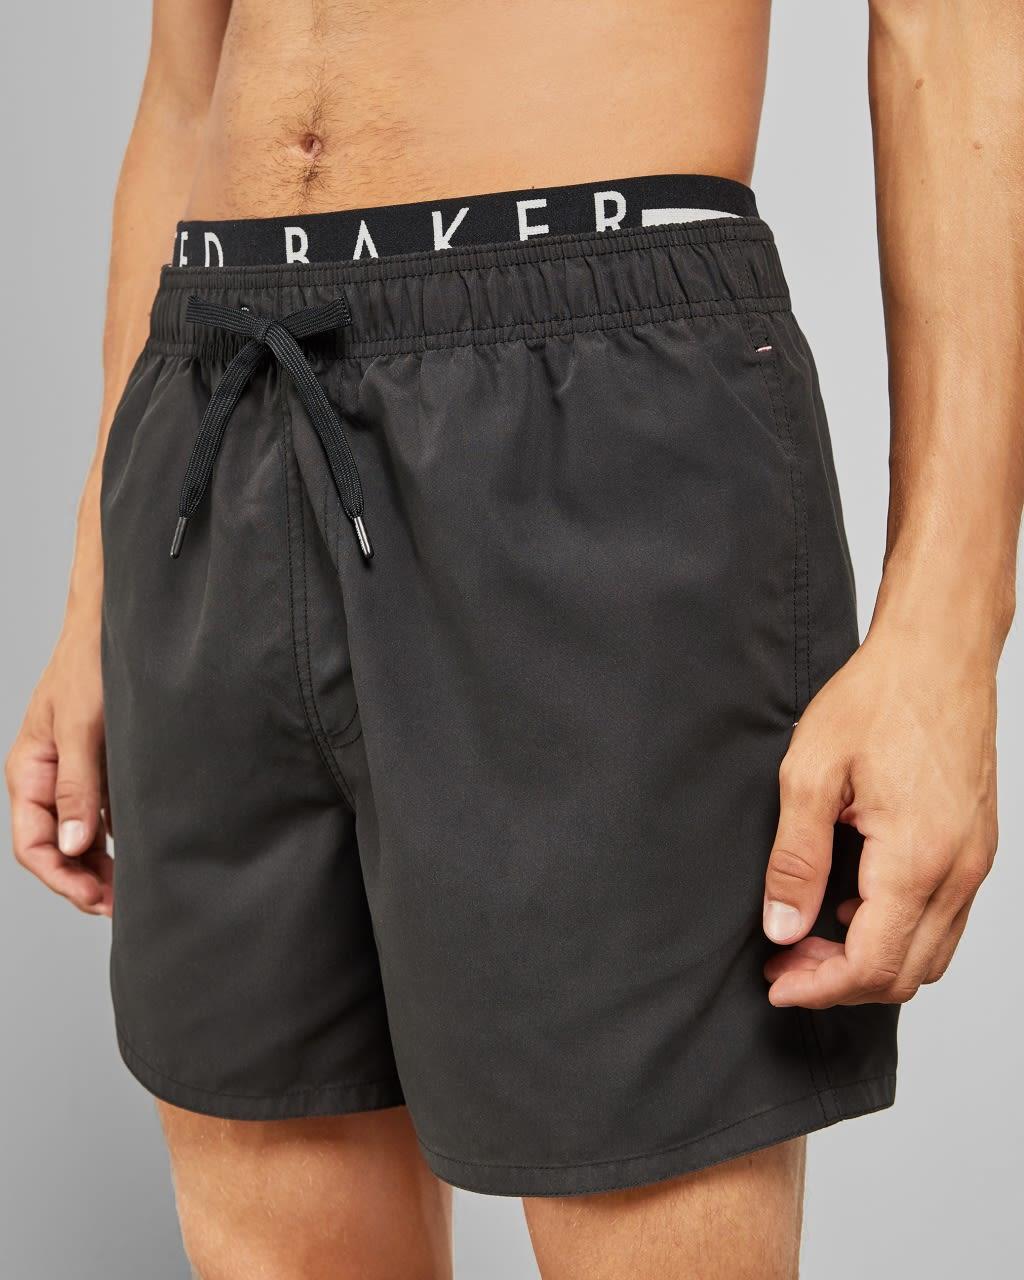 Ted Baker Branded Swim Shorts  - Black - Size: Extra Large